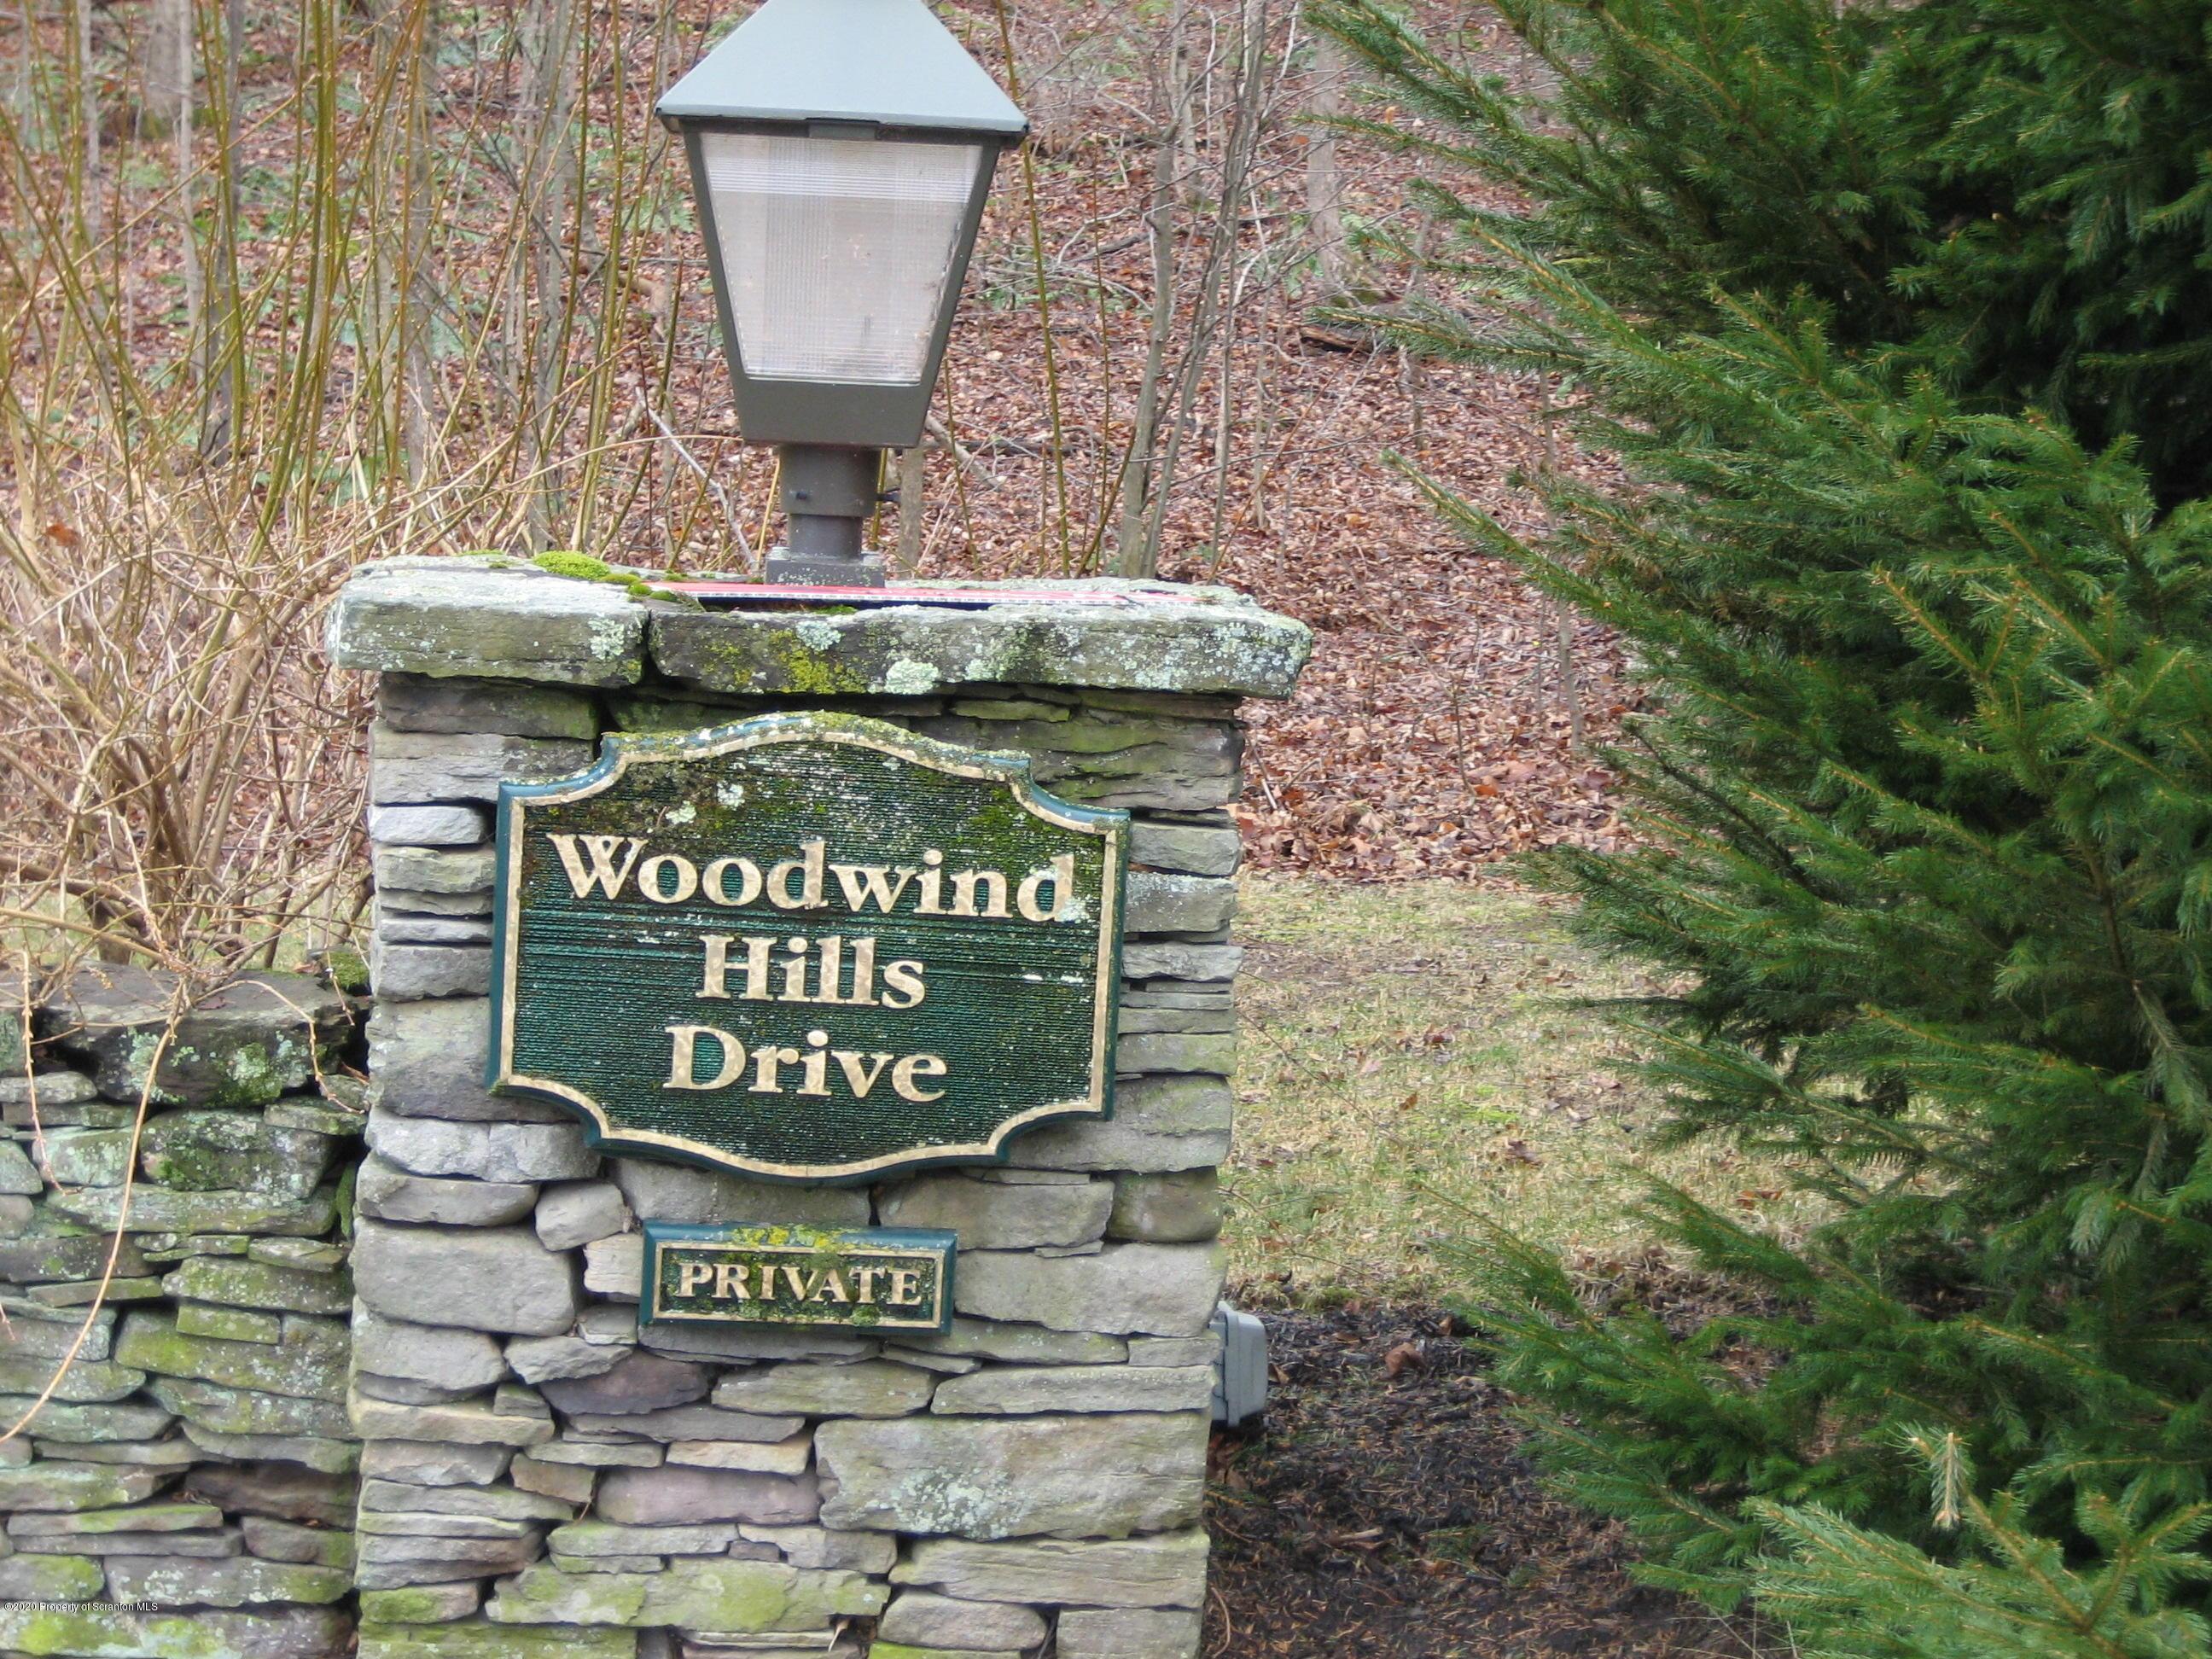 1005 Woodwind Hills Dr, Dalton, Pennsylvania 18414, ,Land,For Sale,Woodwind Hills,20-824